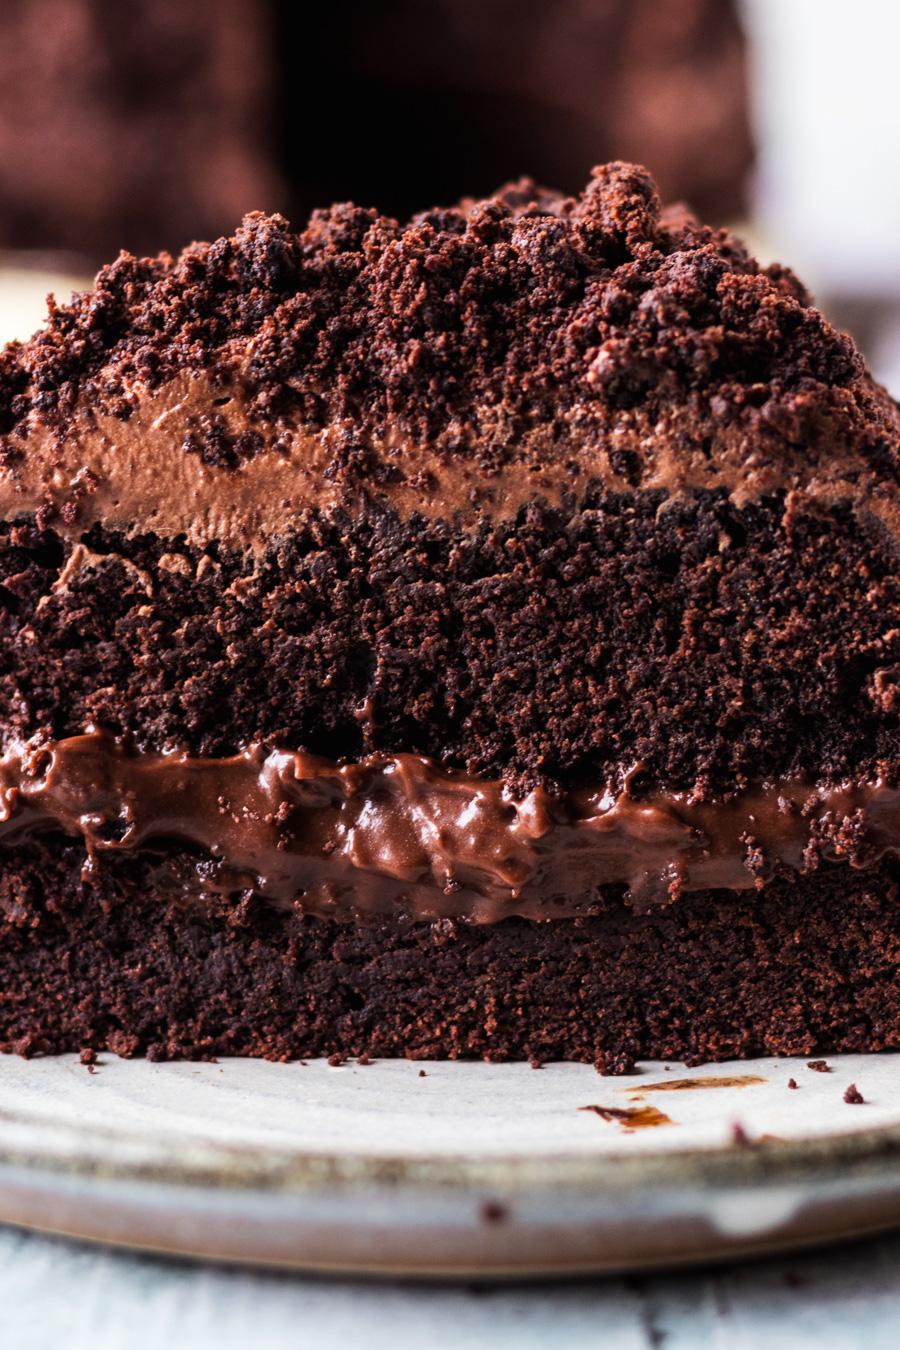 Vegan Brooklyn Chocolate Blackout Cake